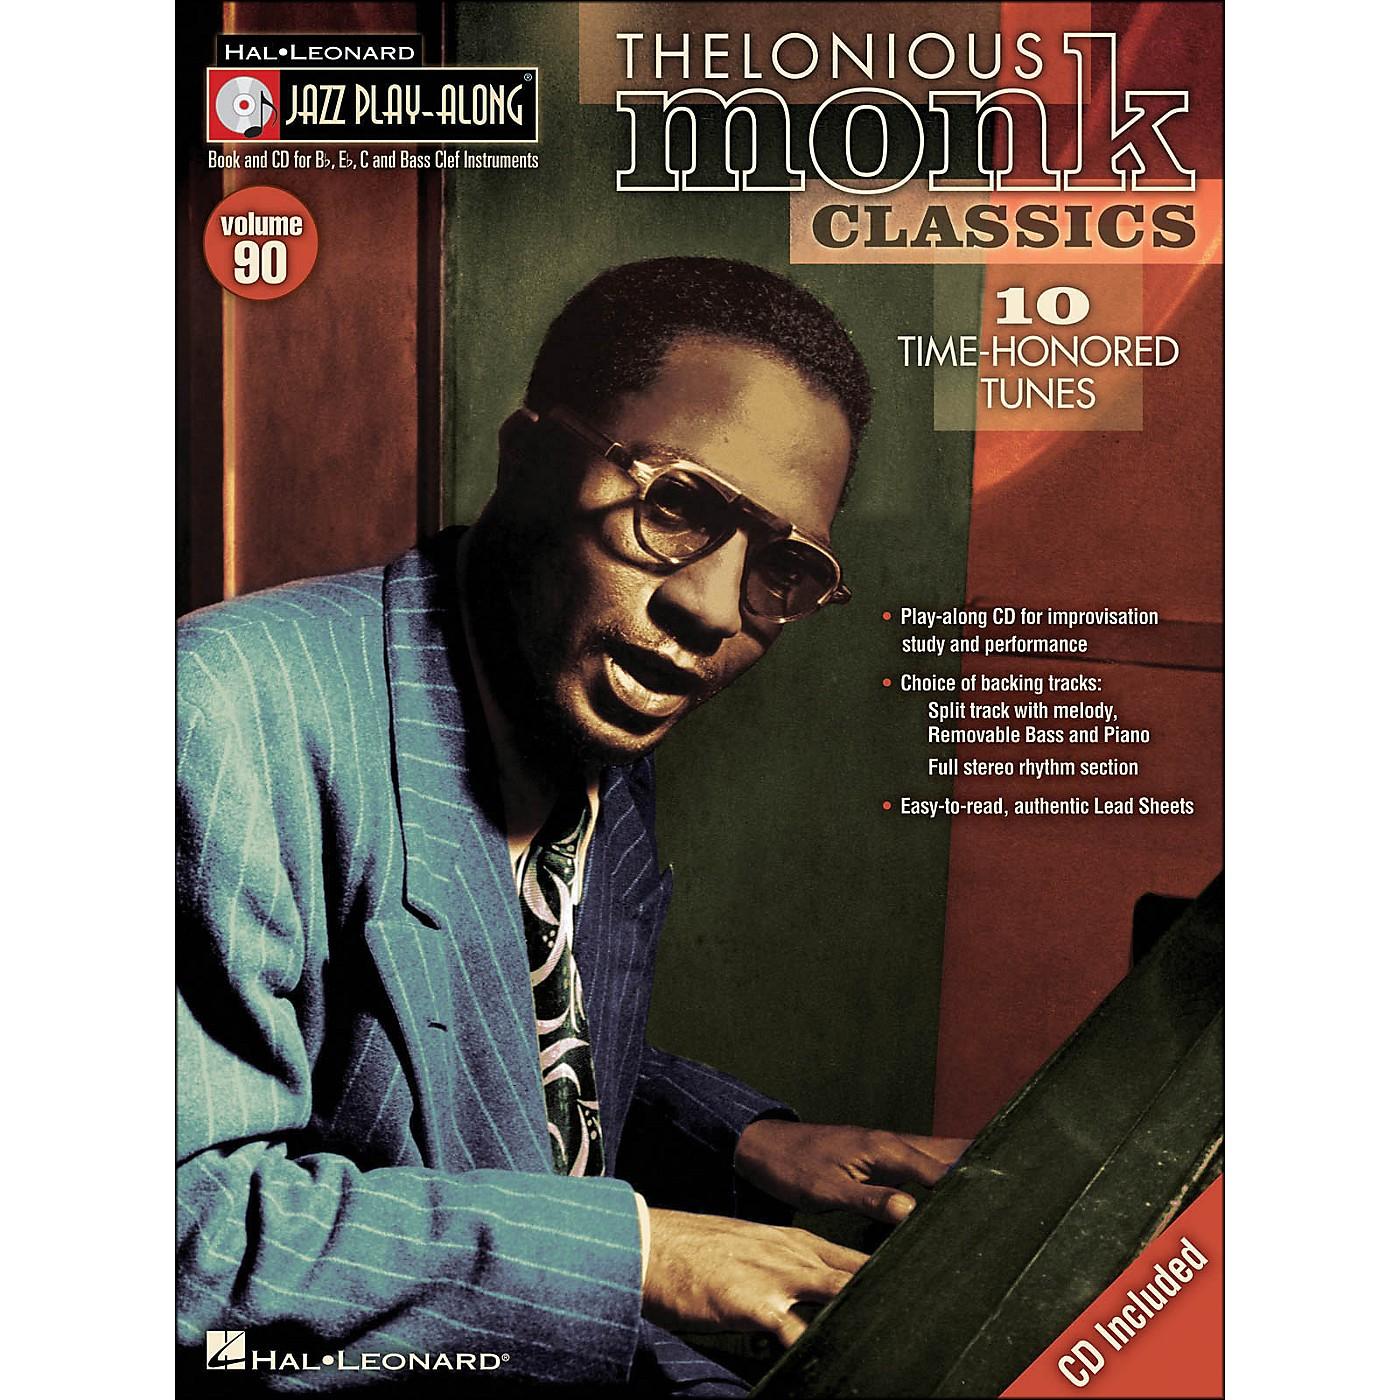 Hal Leonard Thelonious Monk Classics - Jazz Play-Along Volume 90 (CD/Pkg) thumbnail